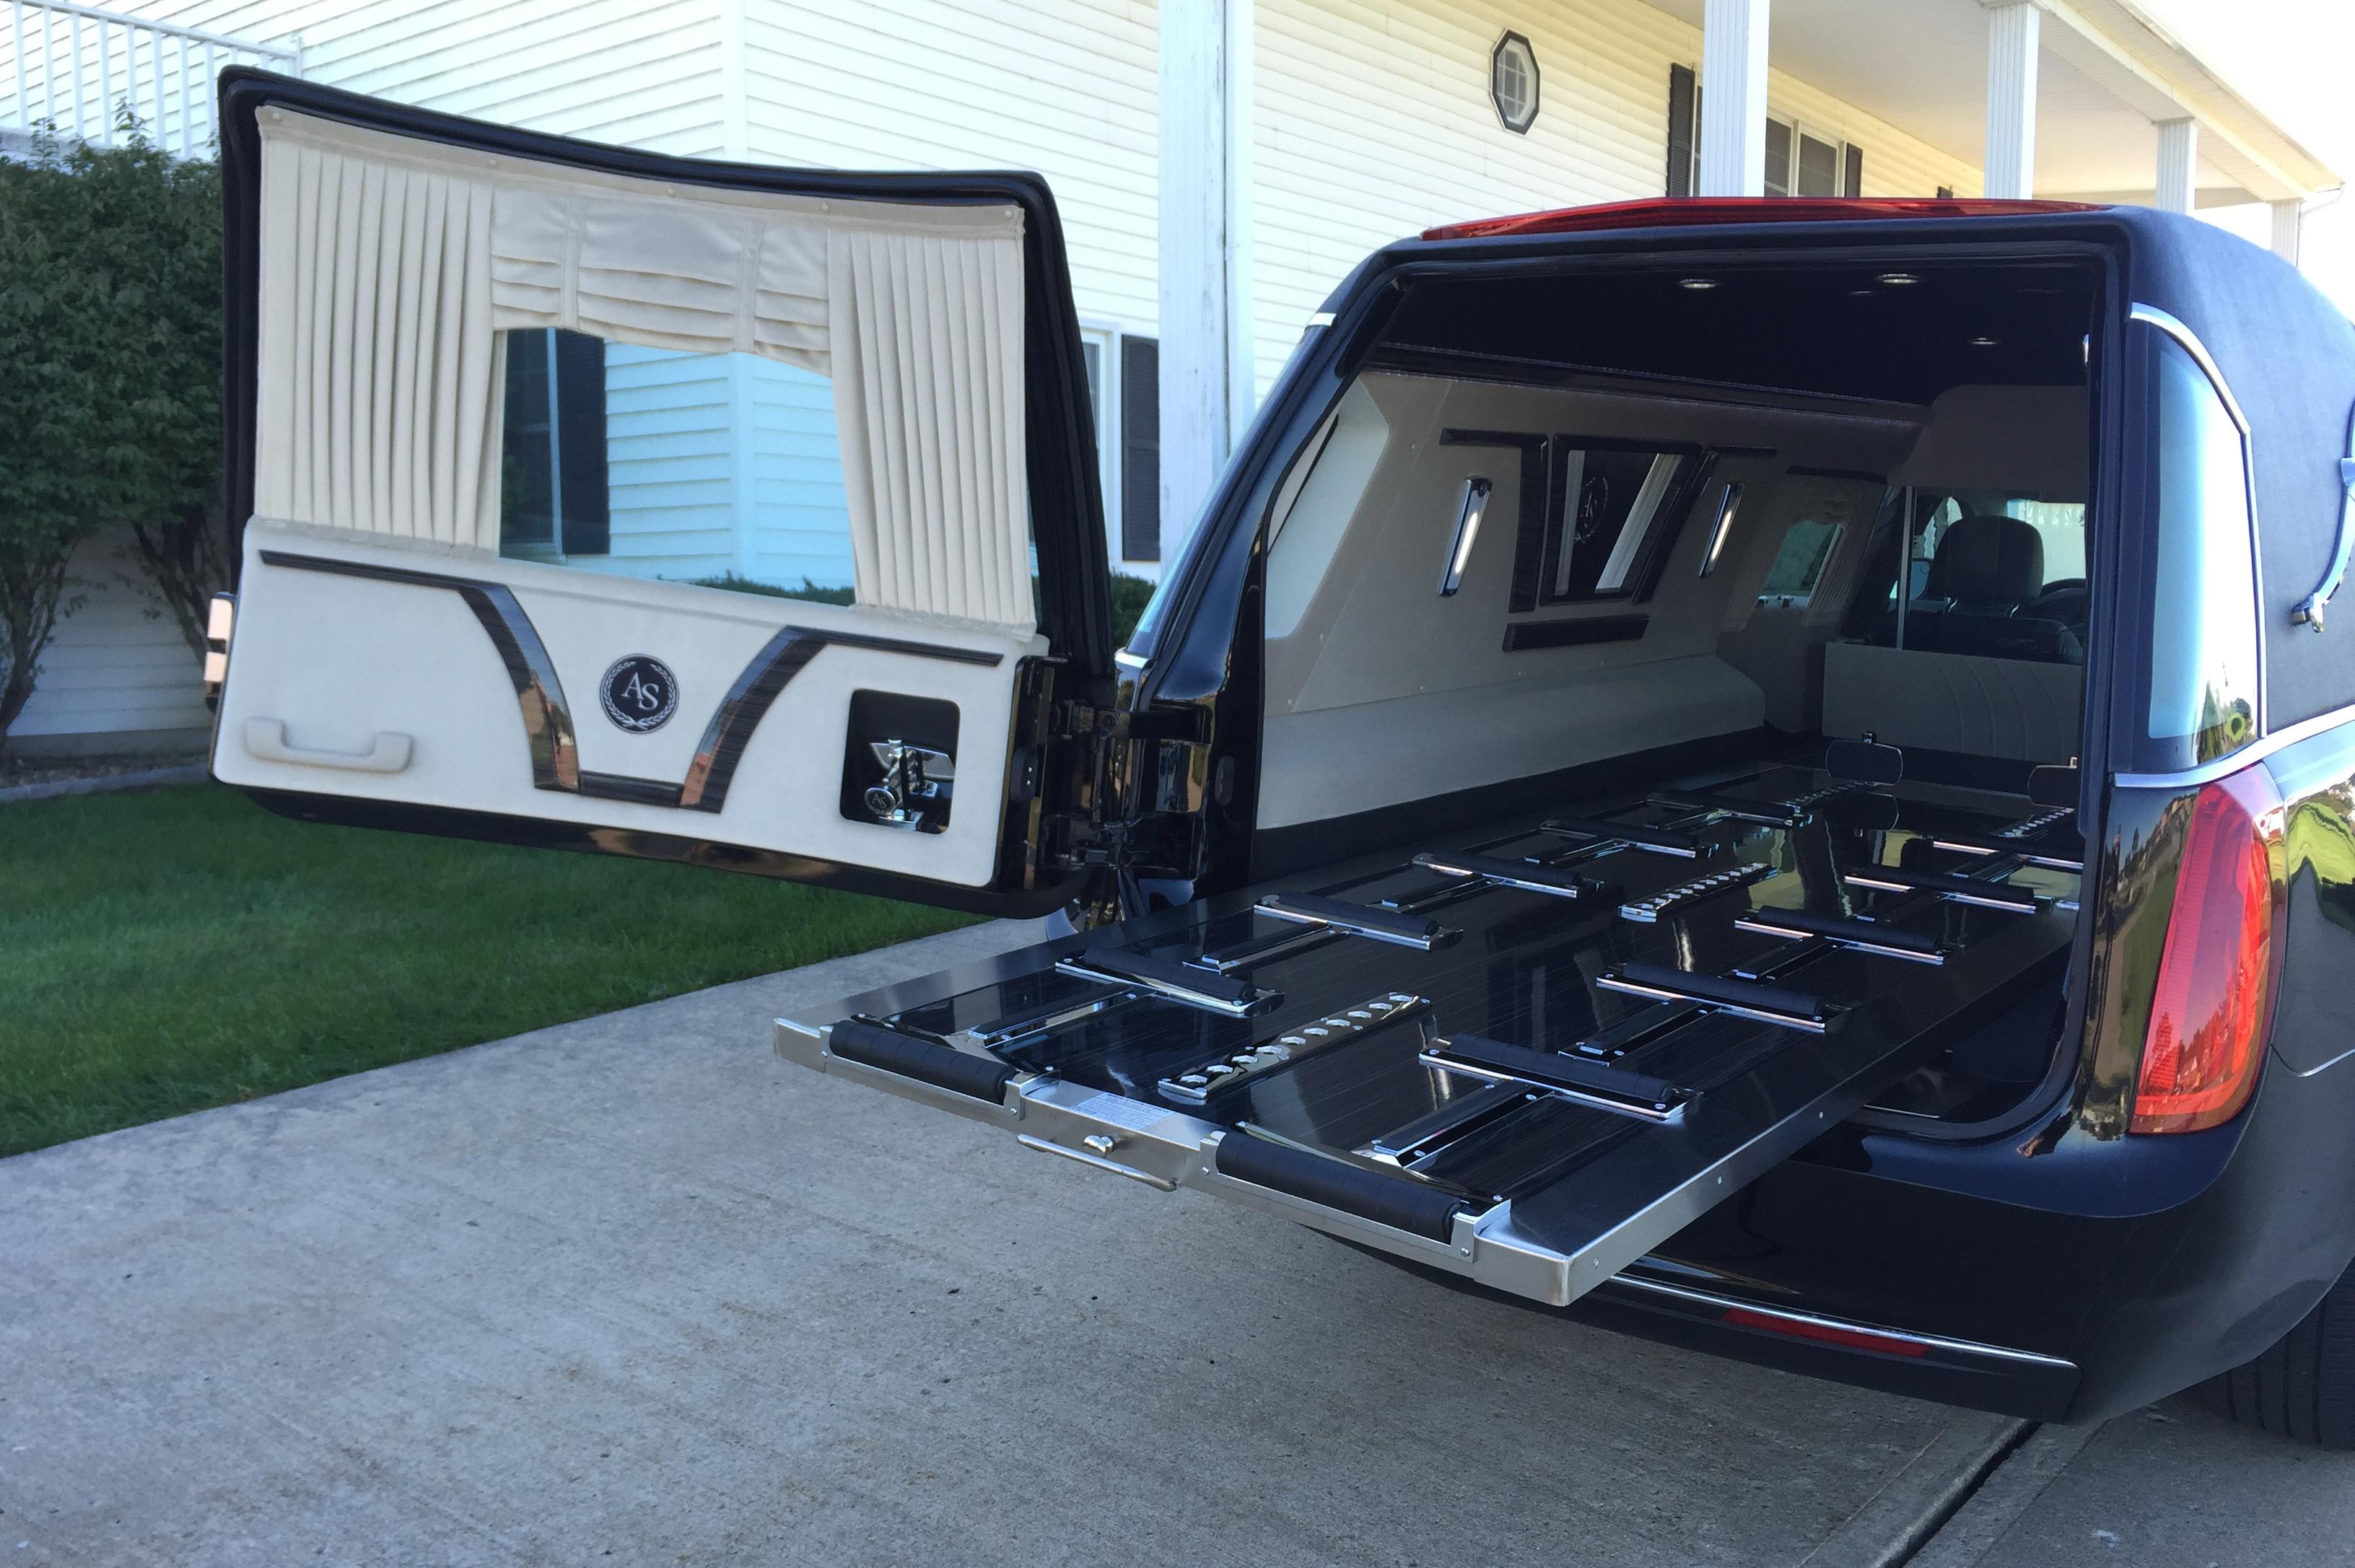 crown landaulet hearse car armbruster stageway. Black Bedroom Furniture Sets. Home Design Ideas